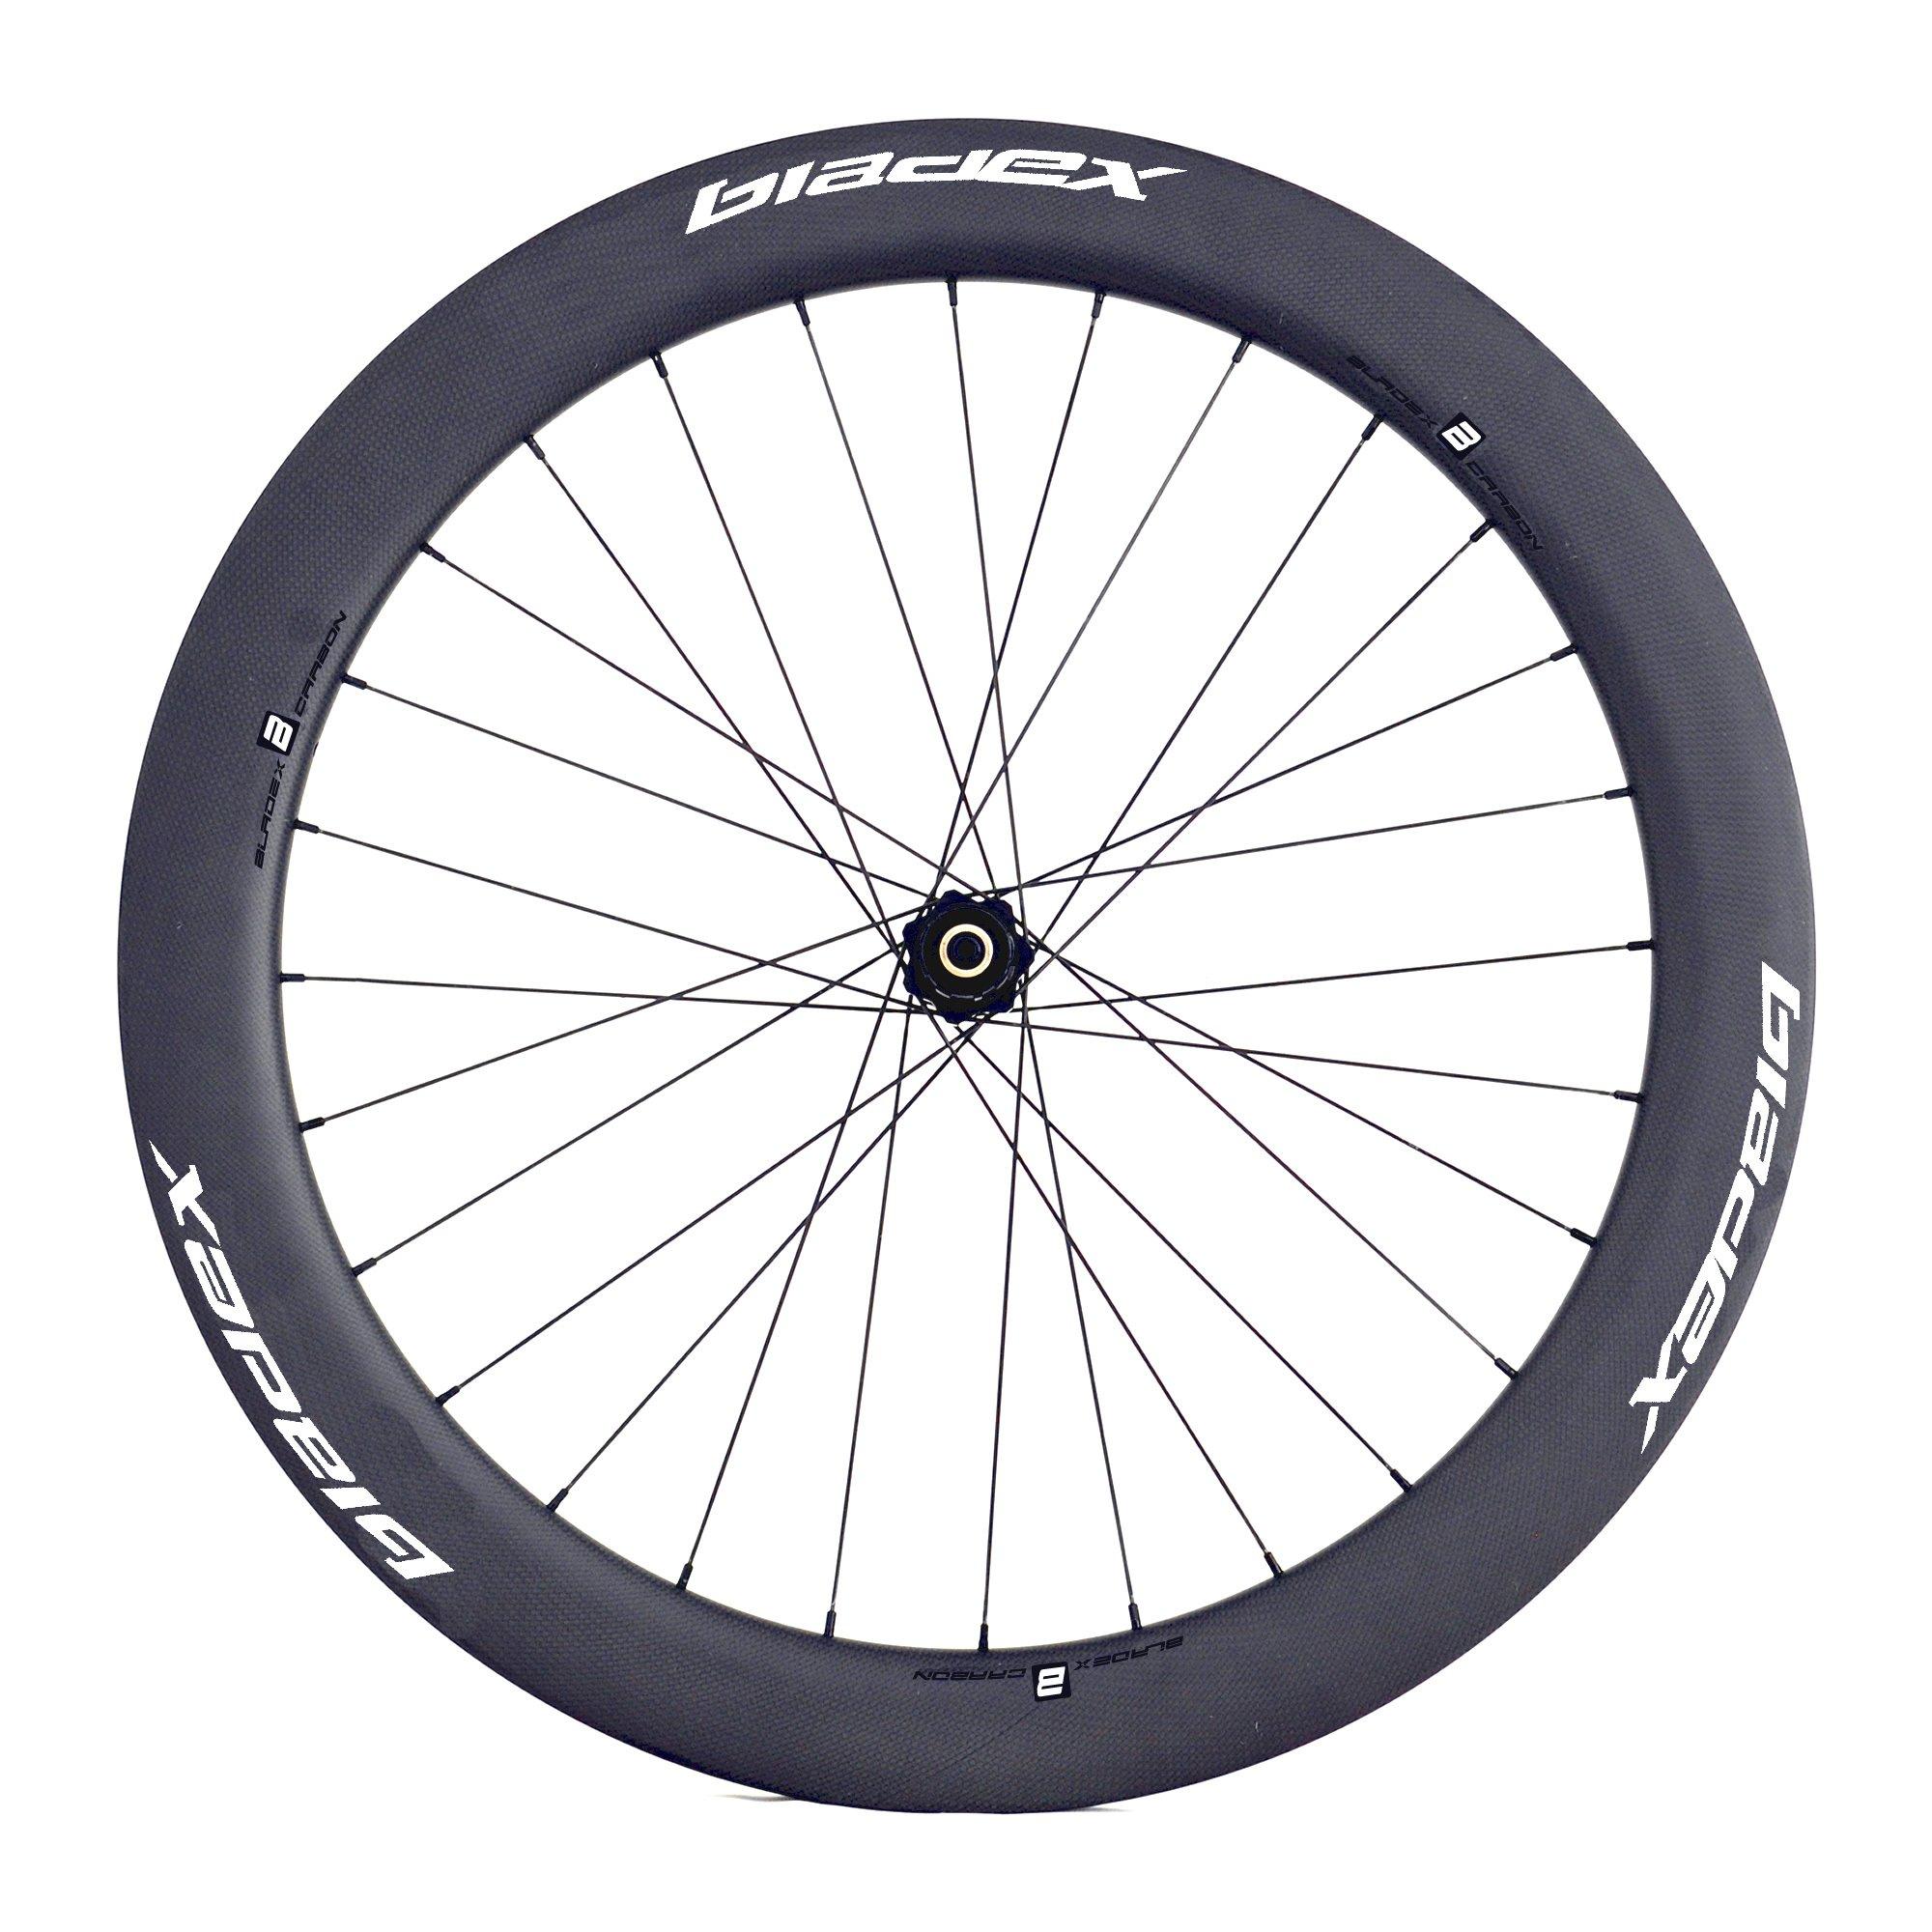 BladeX ULTIAMTE ROAD Disc Brake Road Bike Wheelset Front With White Logo